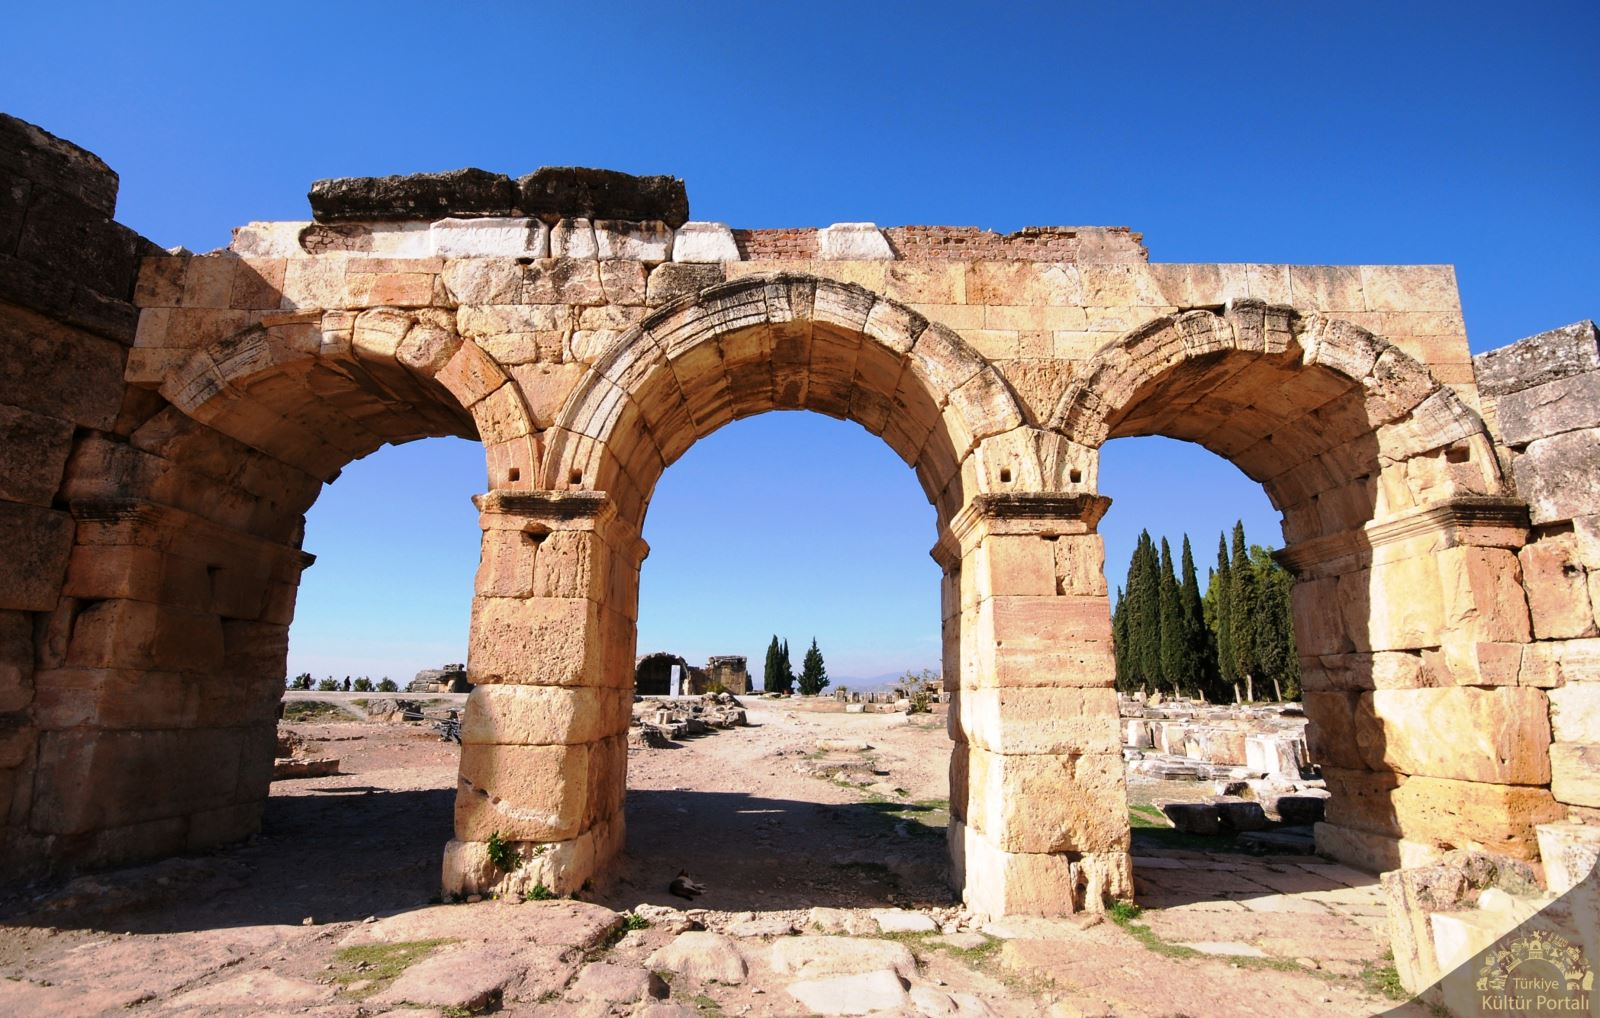 Entrance of the Frontinus street, Denizli